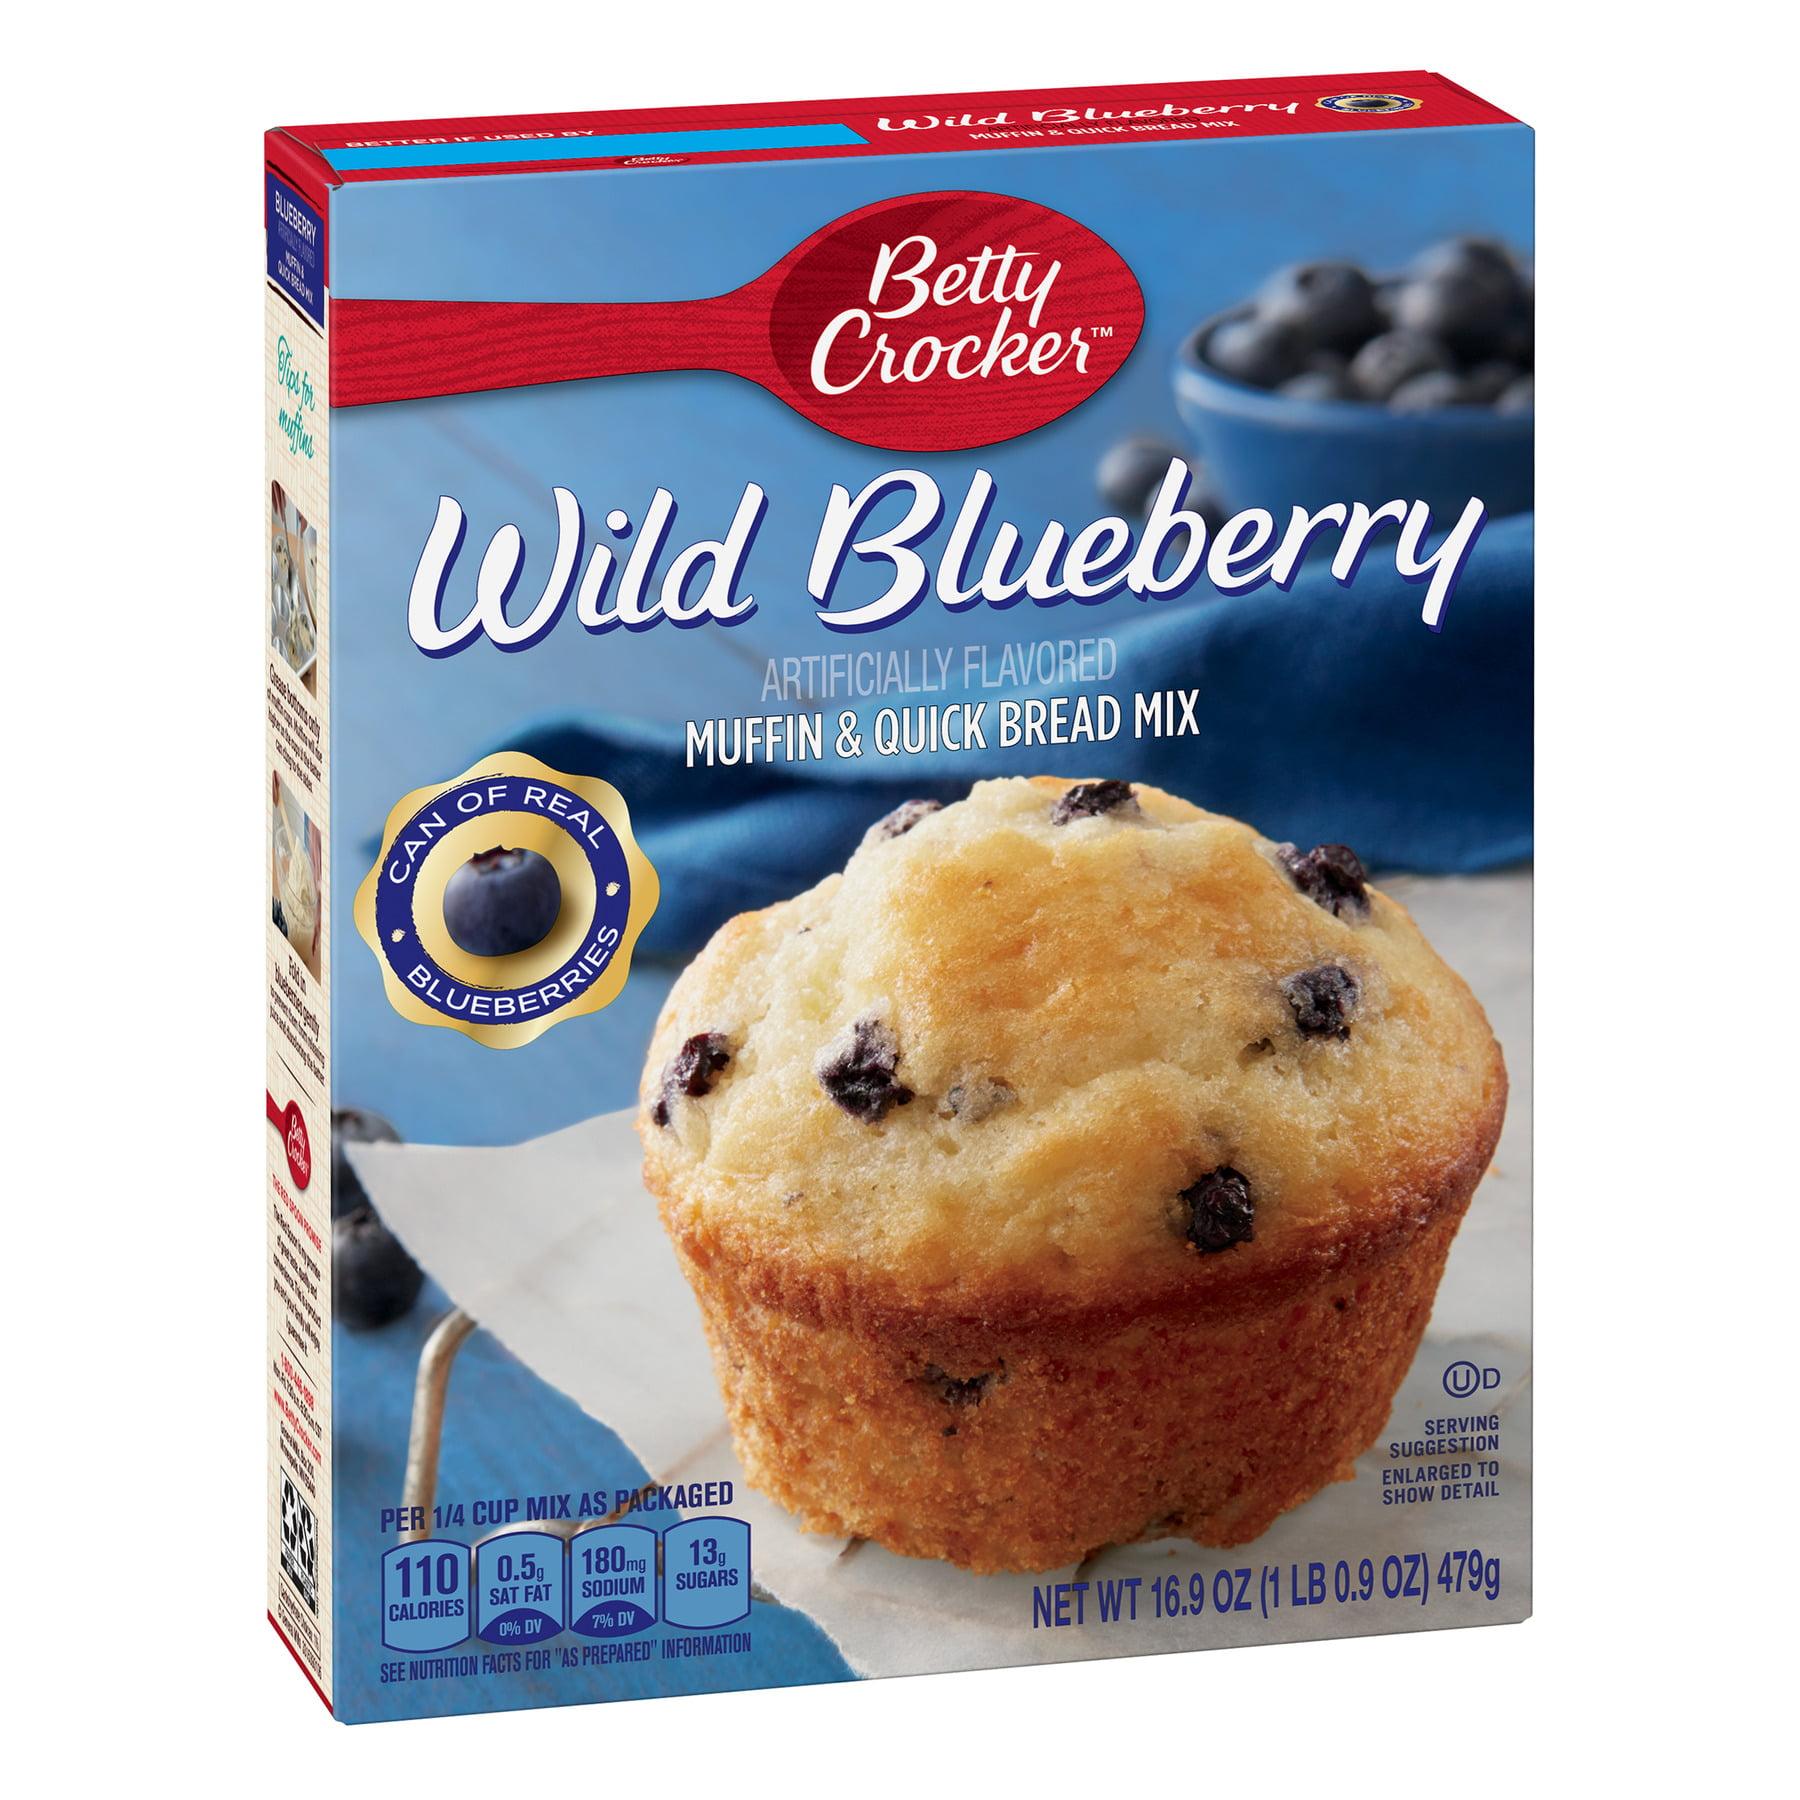 Betty Crocker Wild Blueberry Muffin and Quick Bread Mix 16 9 oz